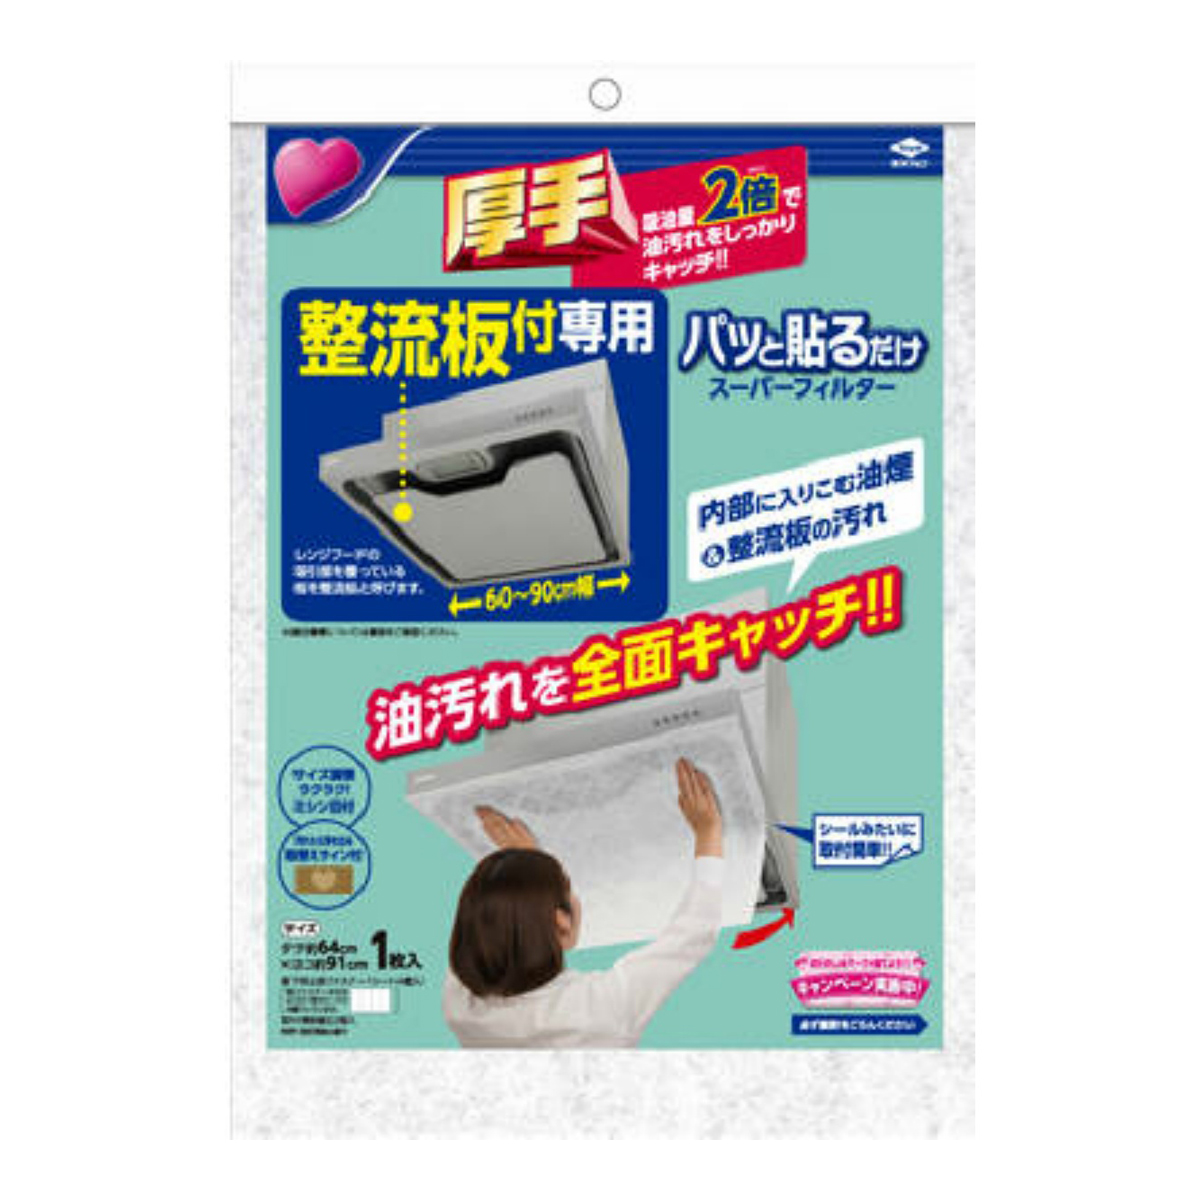 kitchen ventilator spoon himeji distribution center 只是把整流与专用和超级过滤器 4901987230748 厨房用品